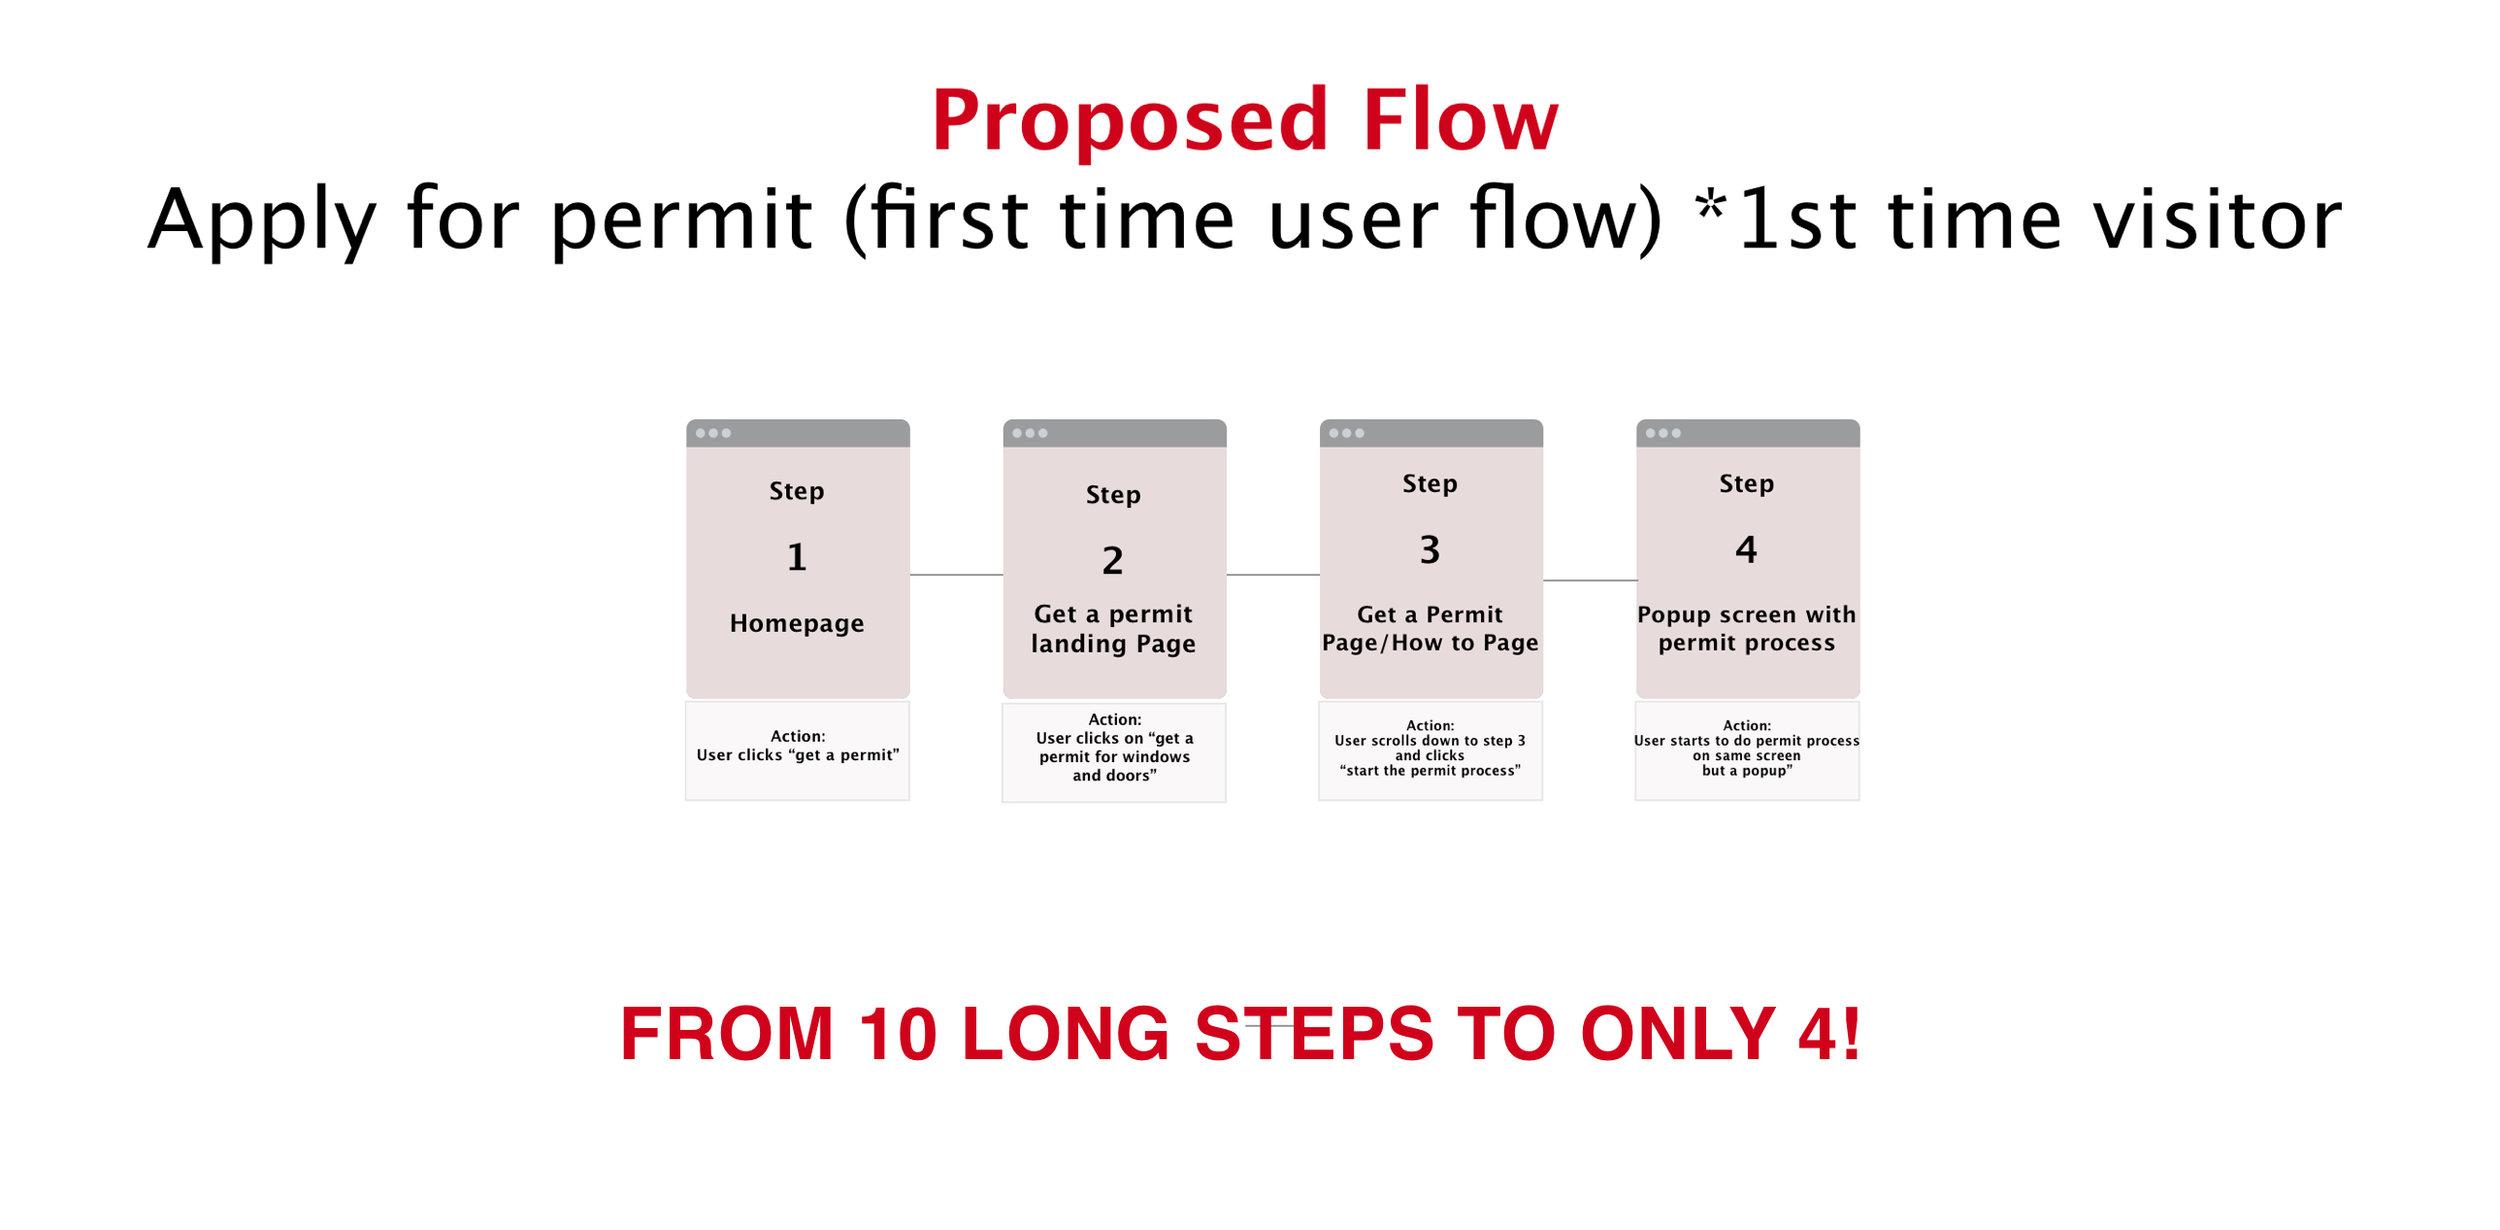 Proposed Flow copy.jpg